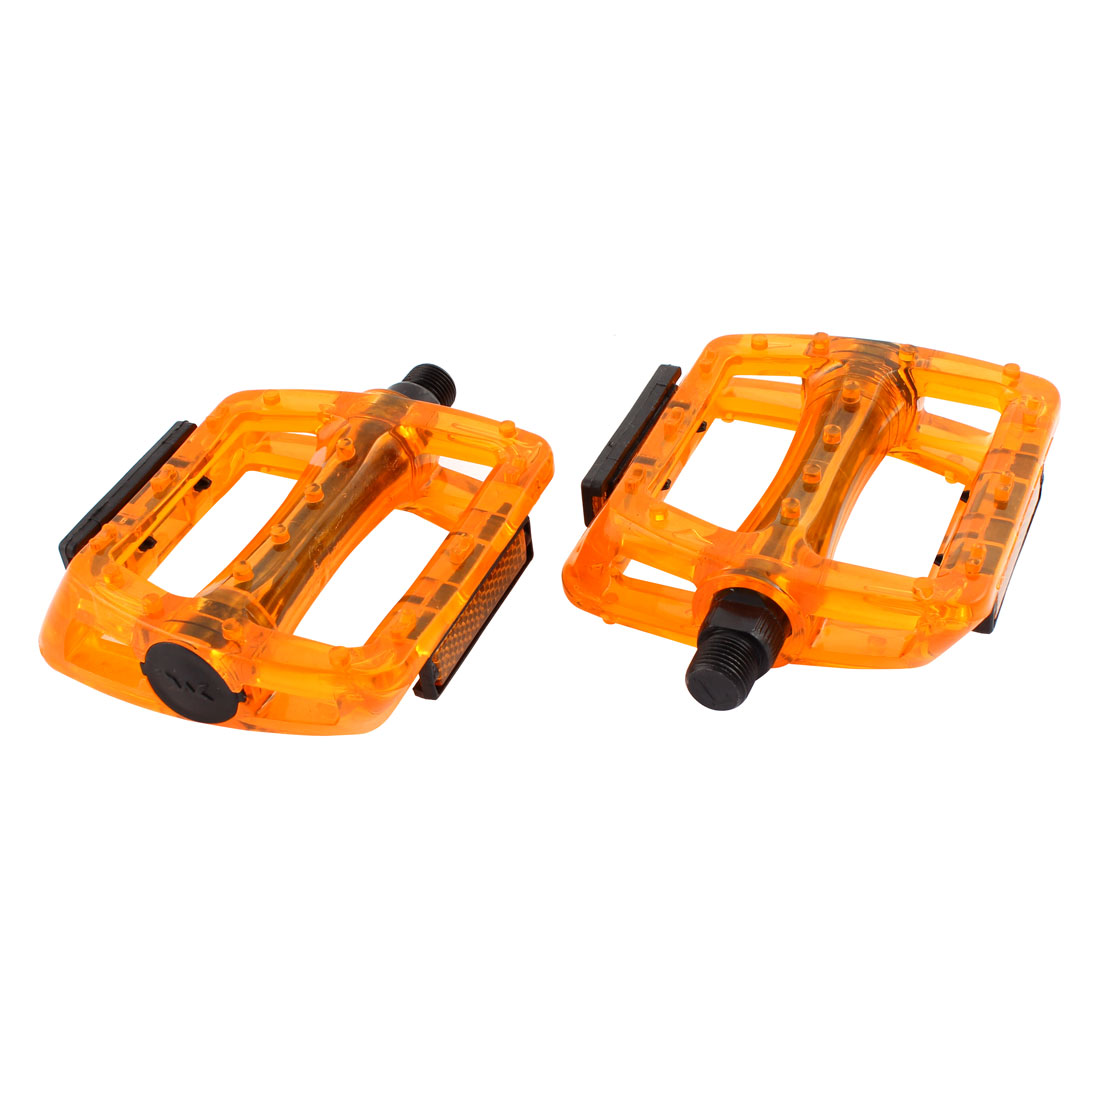 2 Pcs Fixed Gear Bike Bicycie Plastic Platform Pedal Part Orange